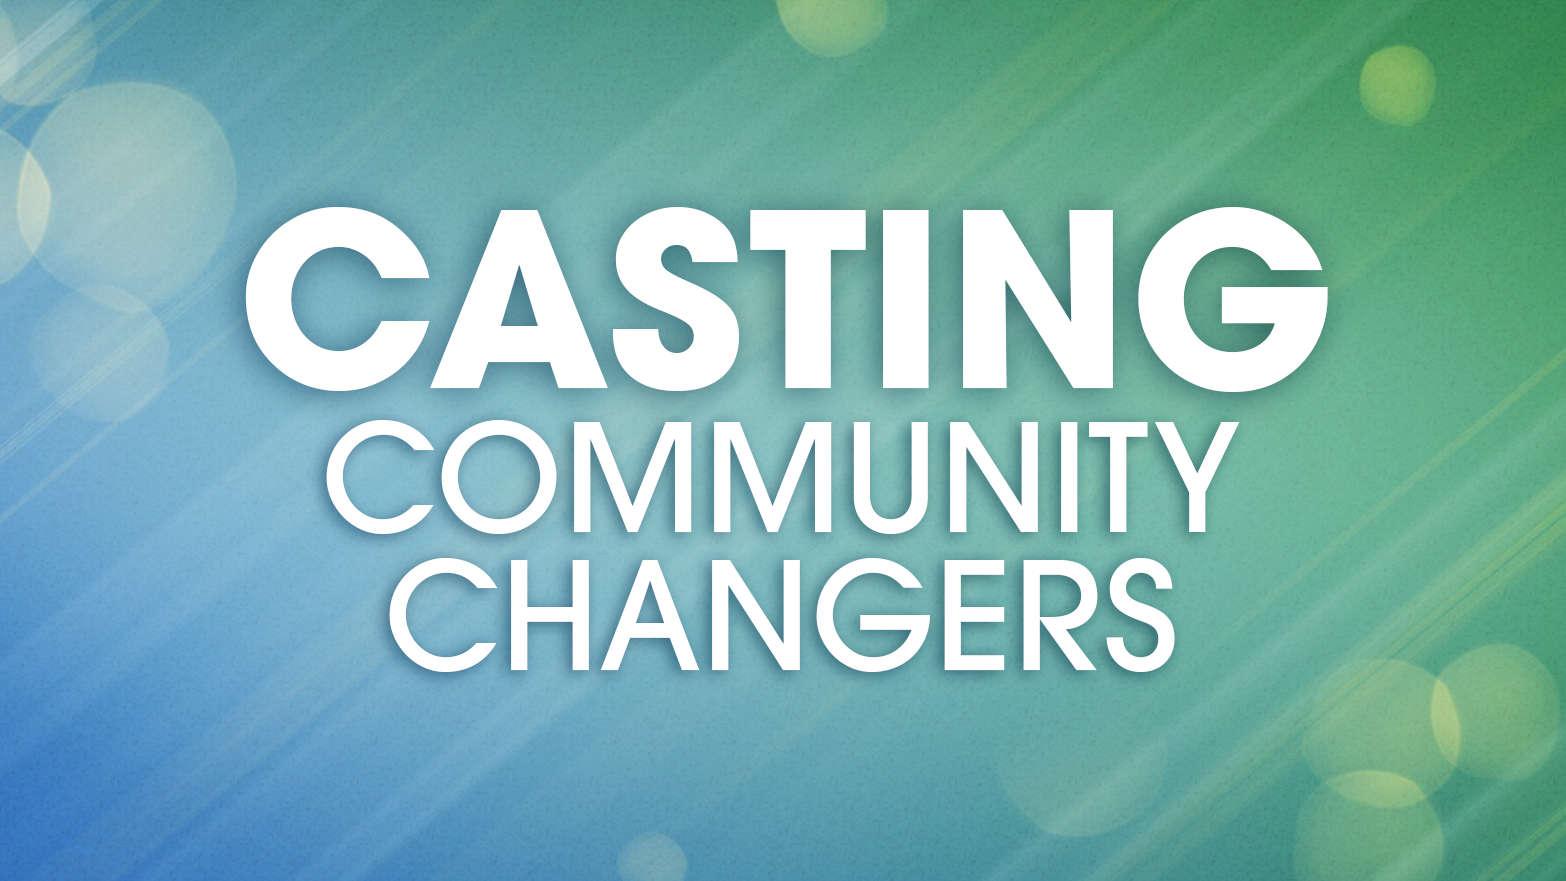 Casting Community Changers